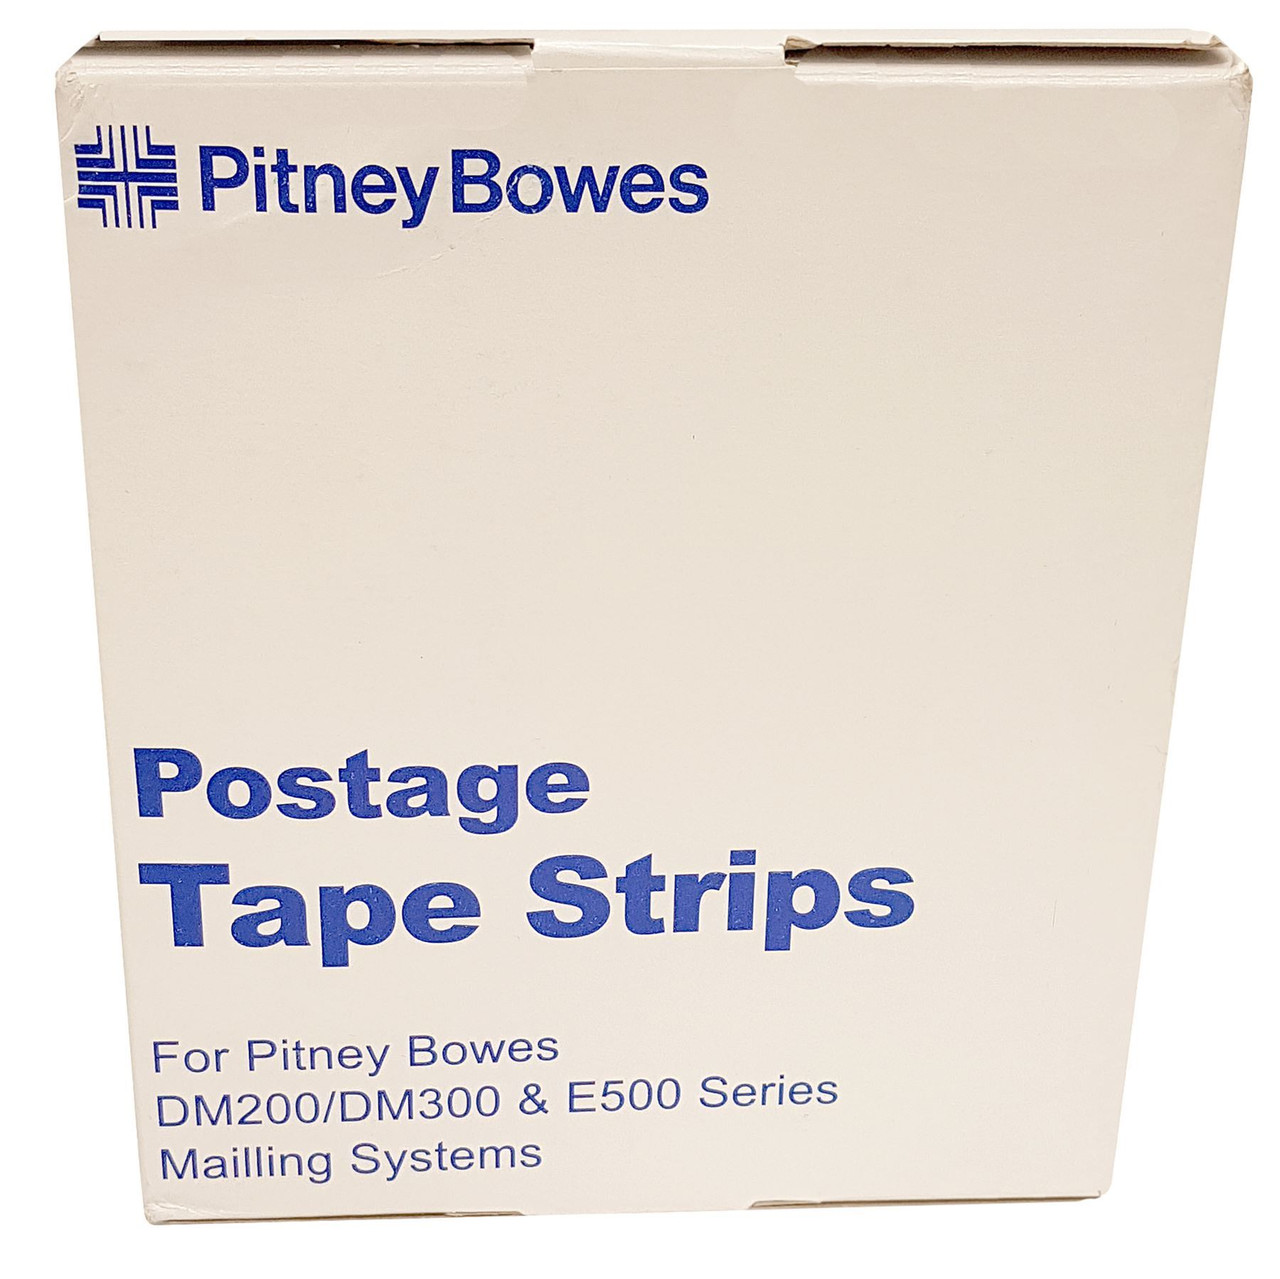 300 Pitney Bowes Original Franking Machine Labels for DM200 DM300 & E500 - Singles